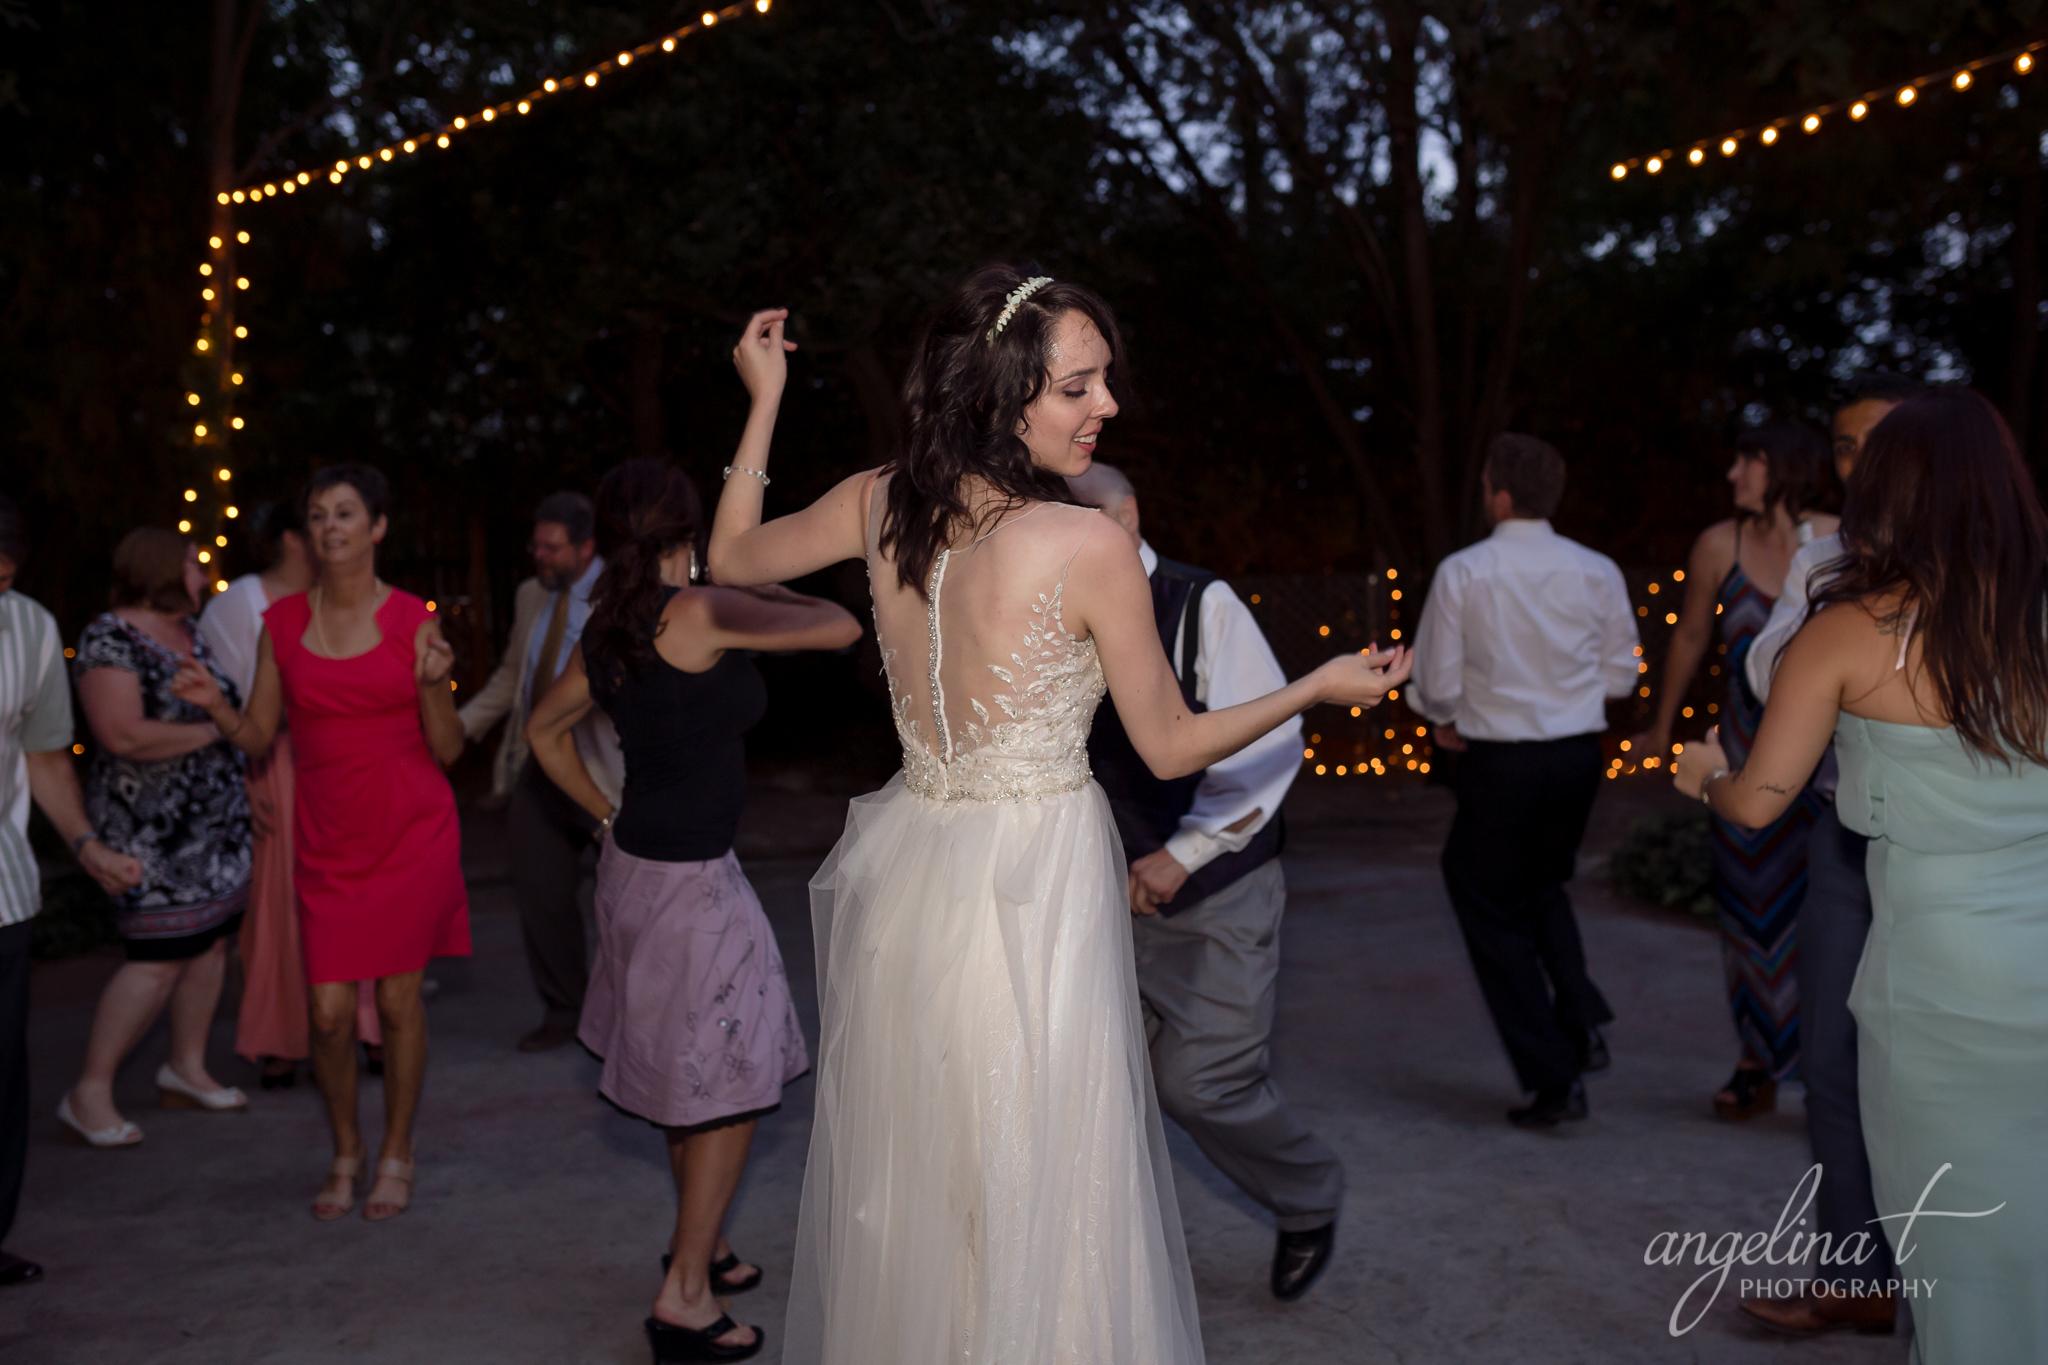 Heirloom-Inn-Garden-Wedding-Photography-Ione-74.JPG